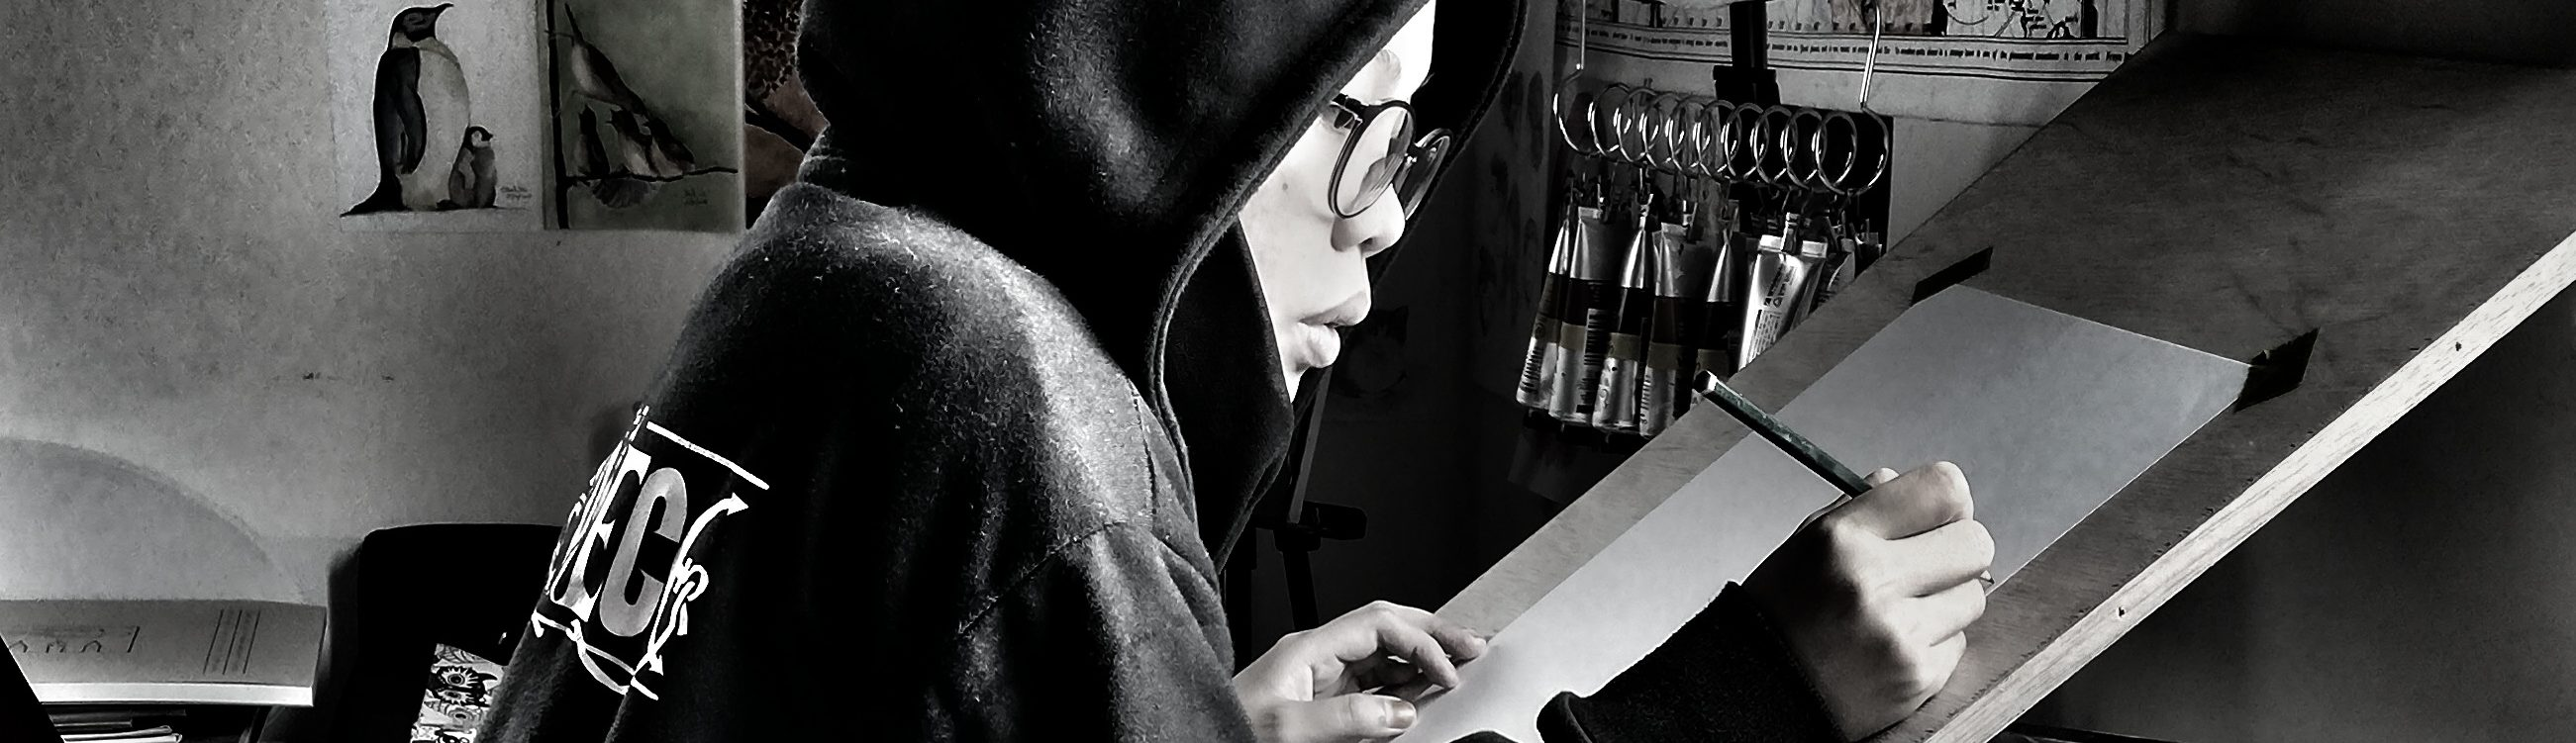 Cha Niki D Artchemist